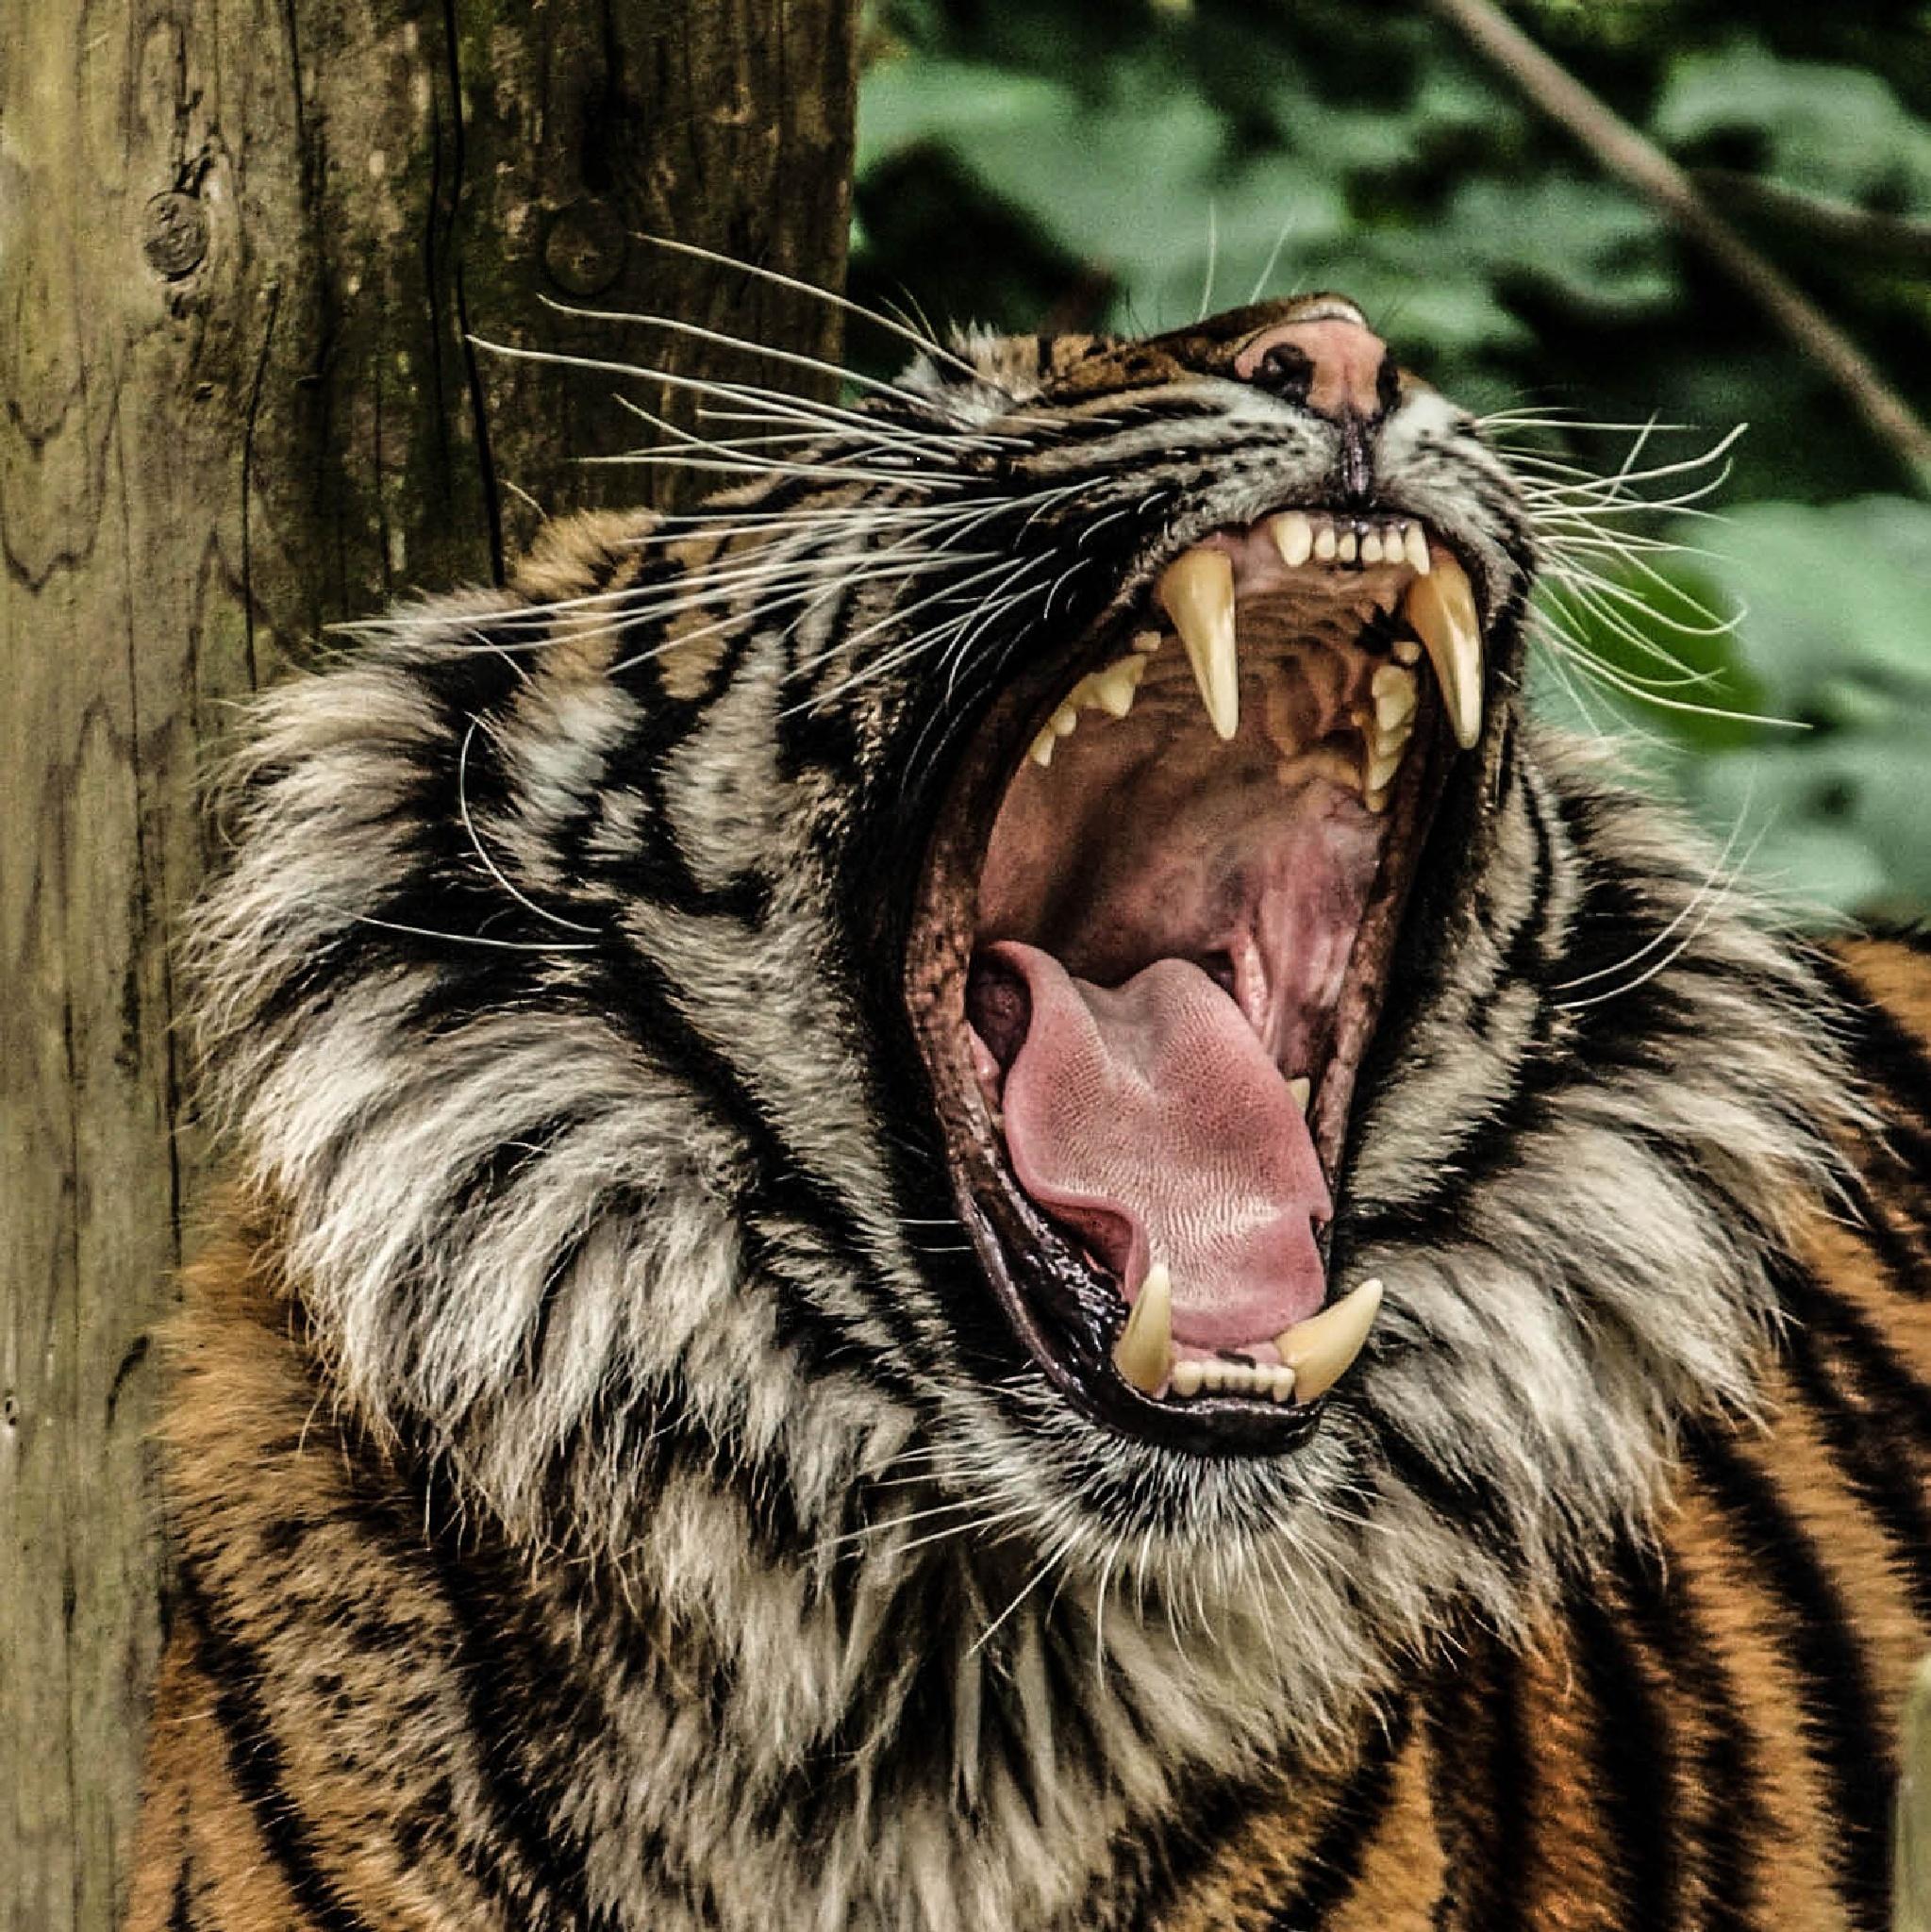 The big yawn by garry-chisholm1